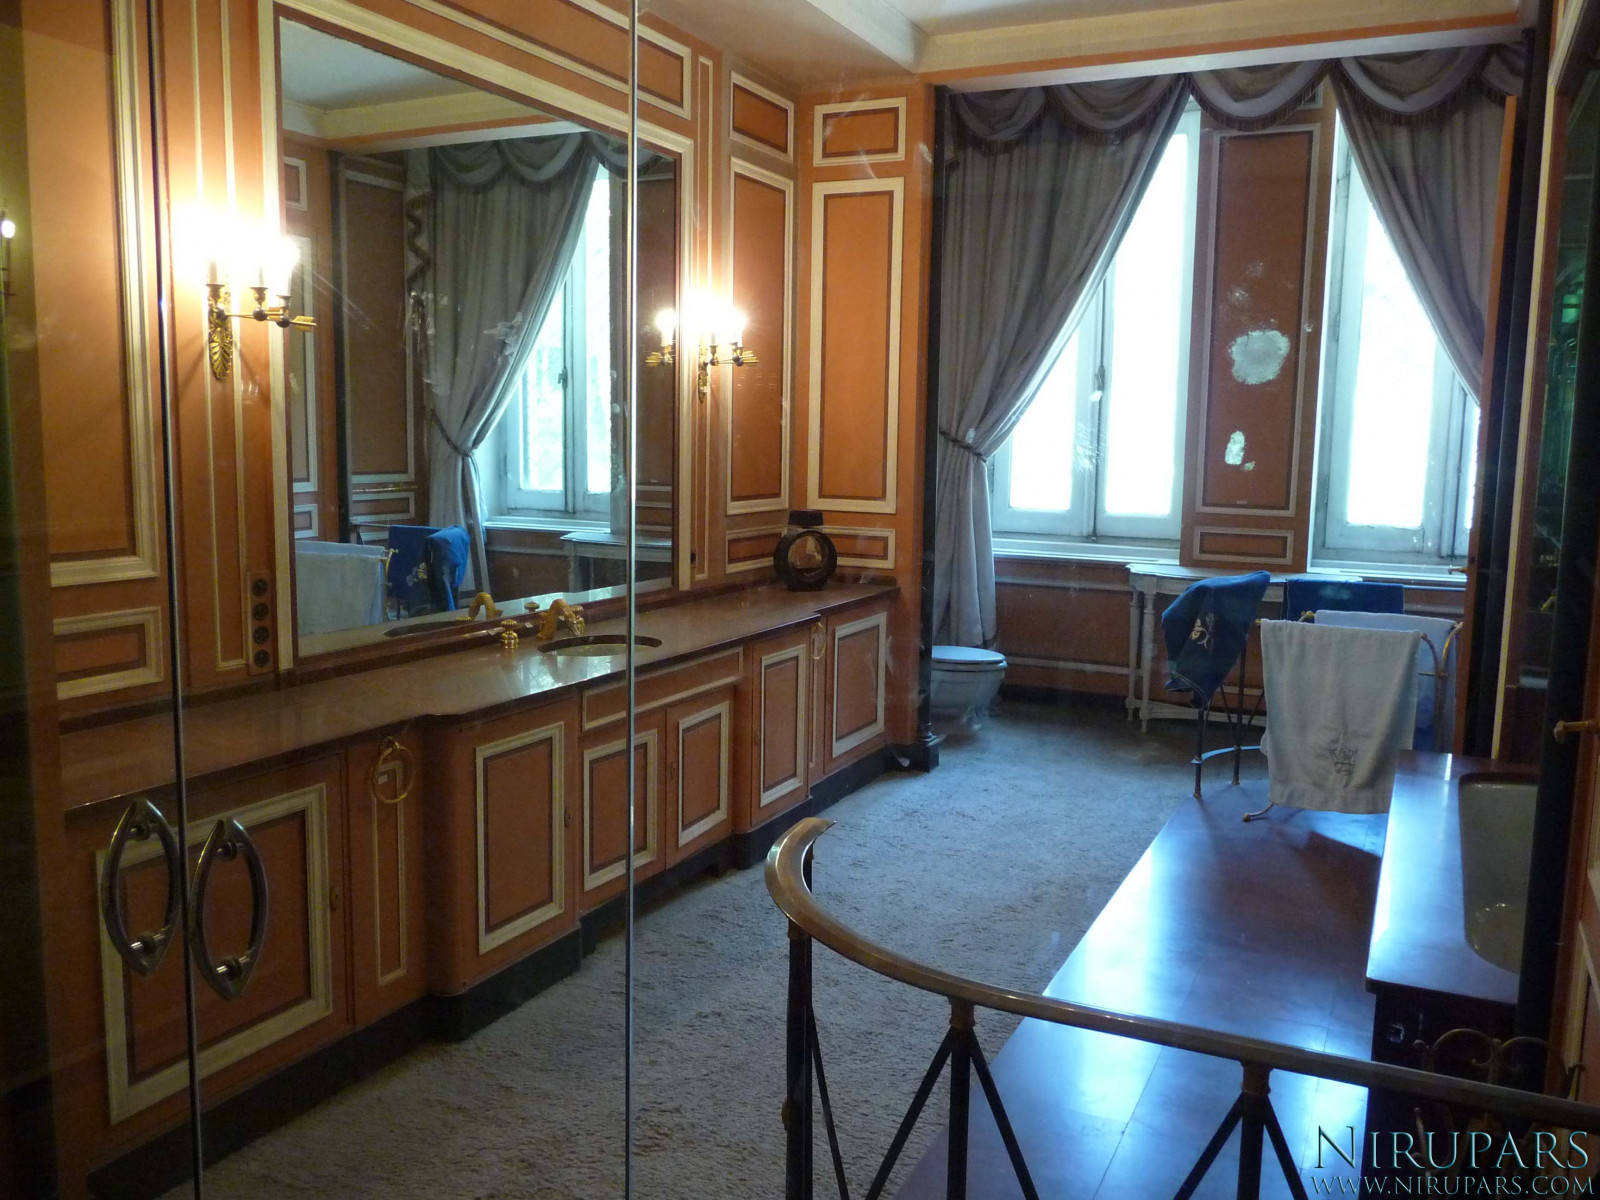 Sadabad Palace Complex - White Palace - Upper Floor - Bathroom